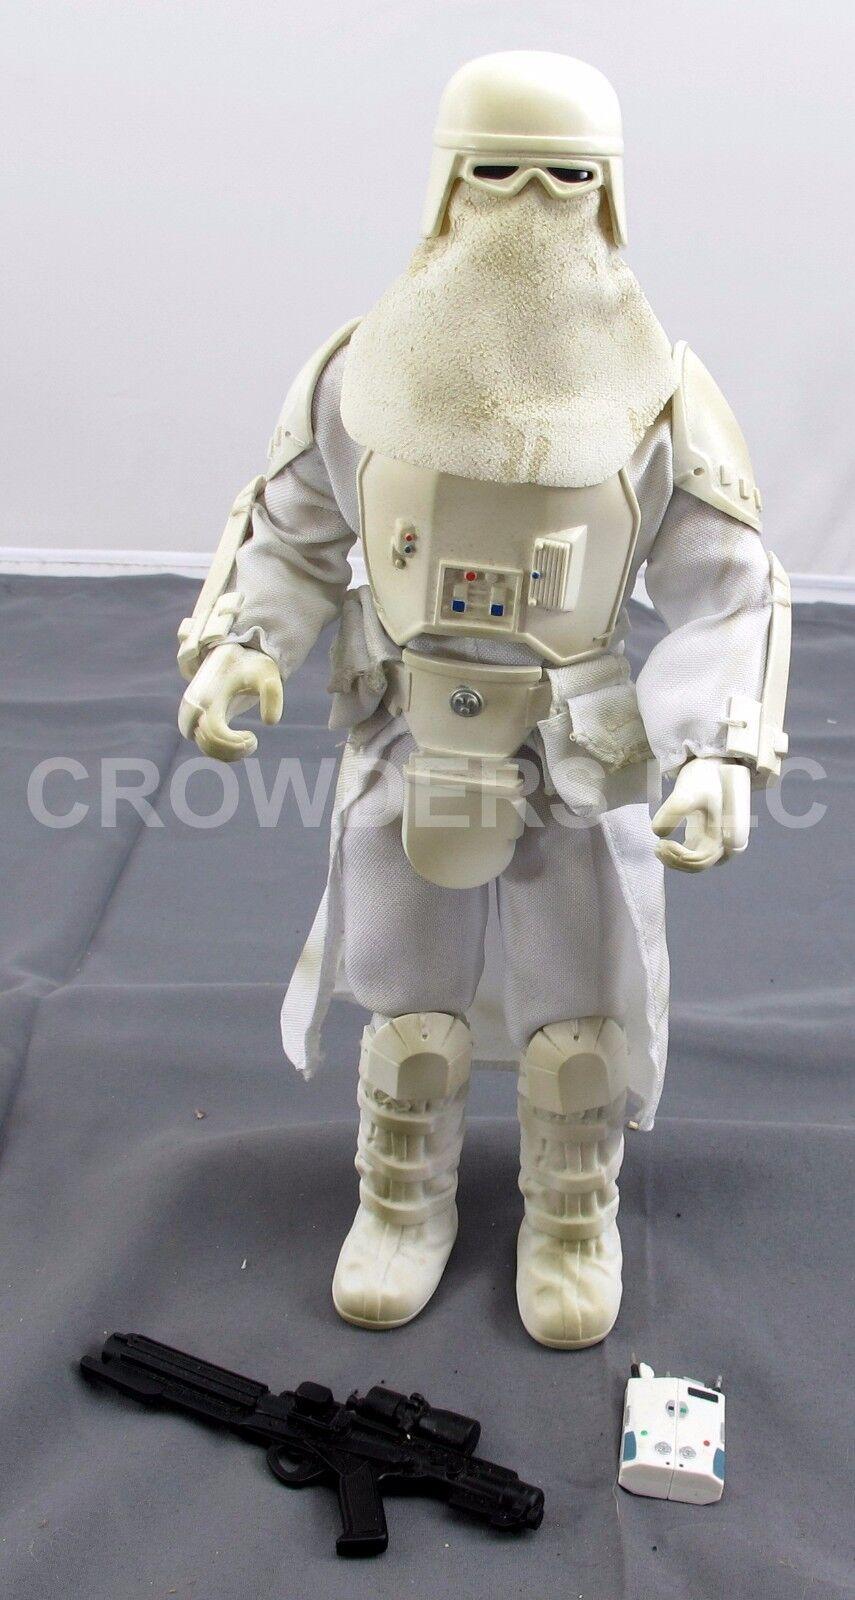 Star Wars Wars Wars 12  Imperial Snowtrooper w  Blaster Rifle & Commlink Hasbro 1999 OOP fc2cac